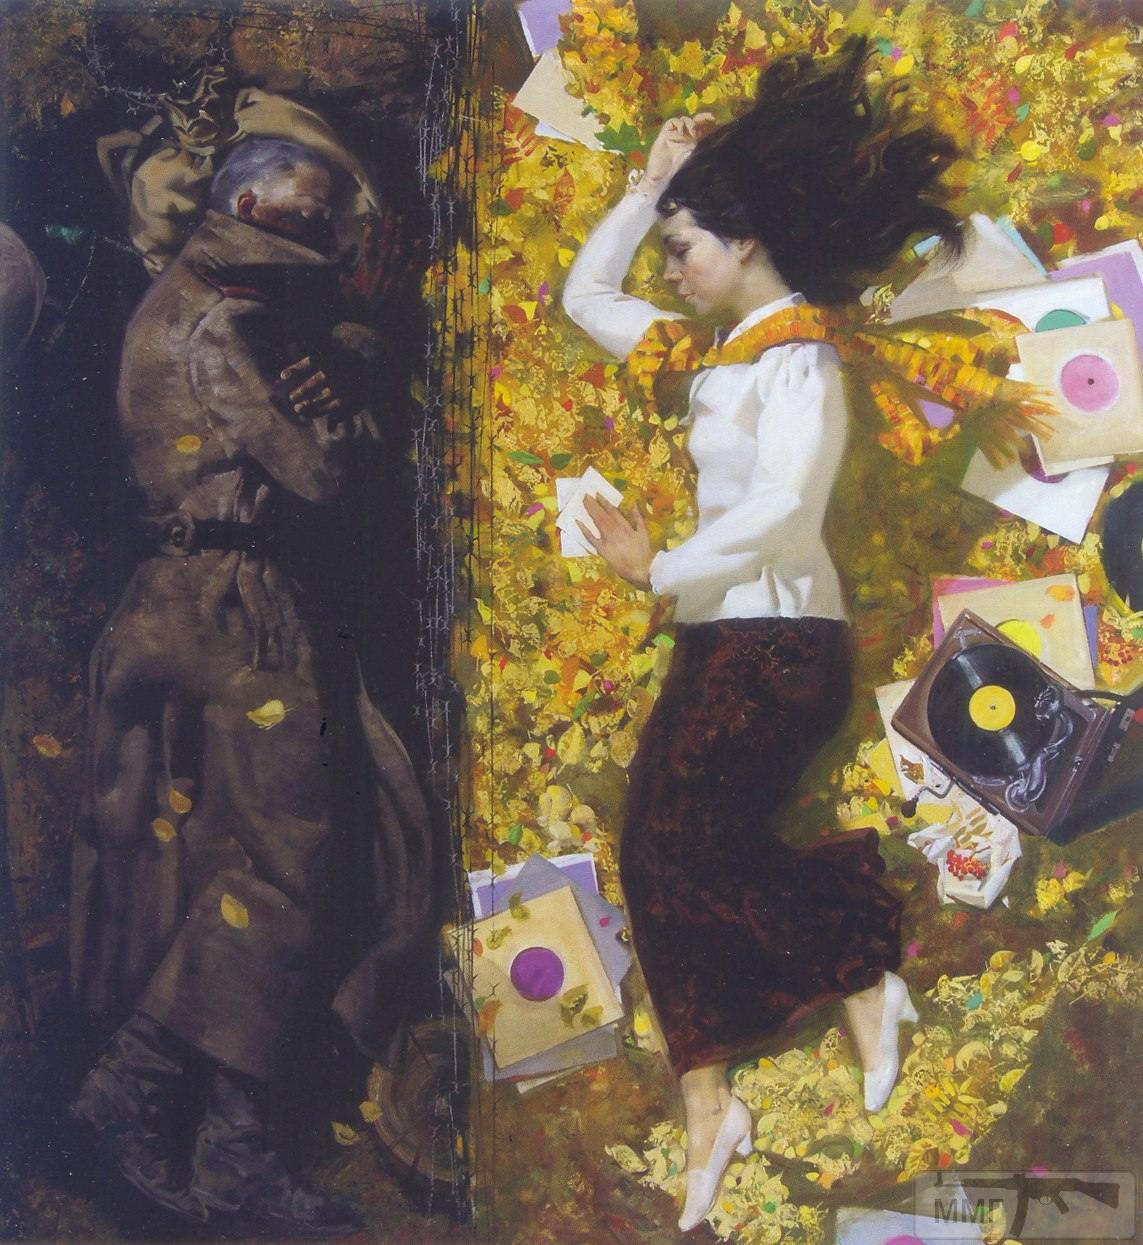 99438 - Поэзия